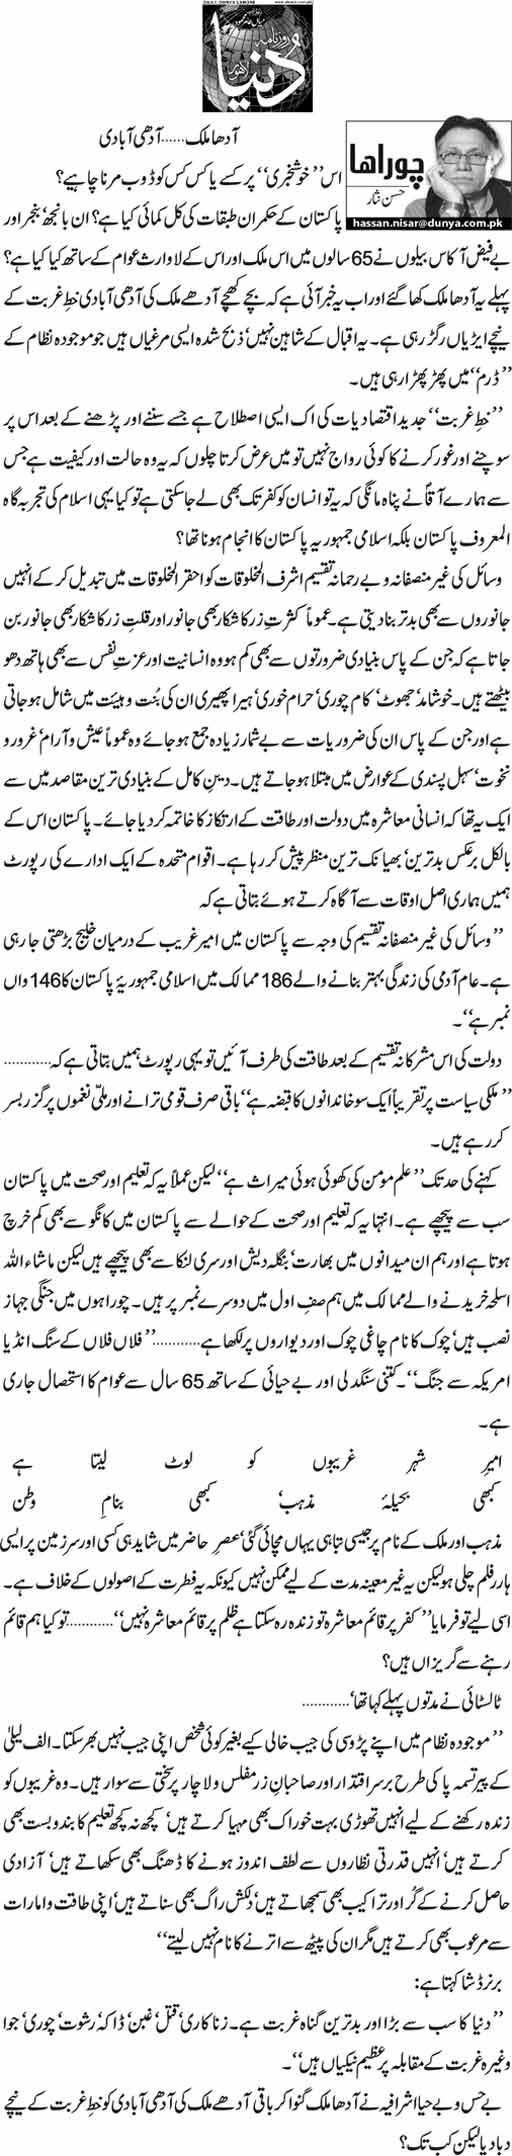 Adha Mulk...Adhi Abadi - Hassan Nisar